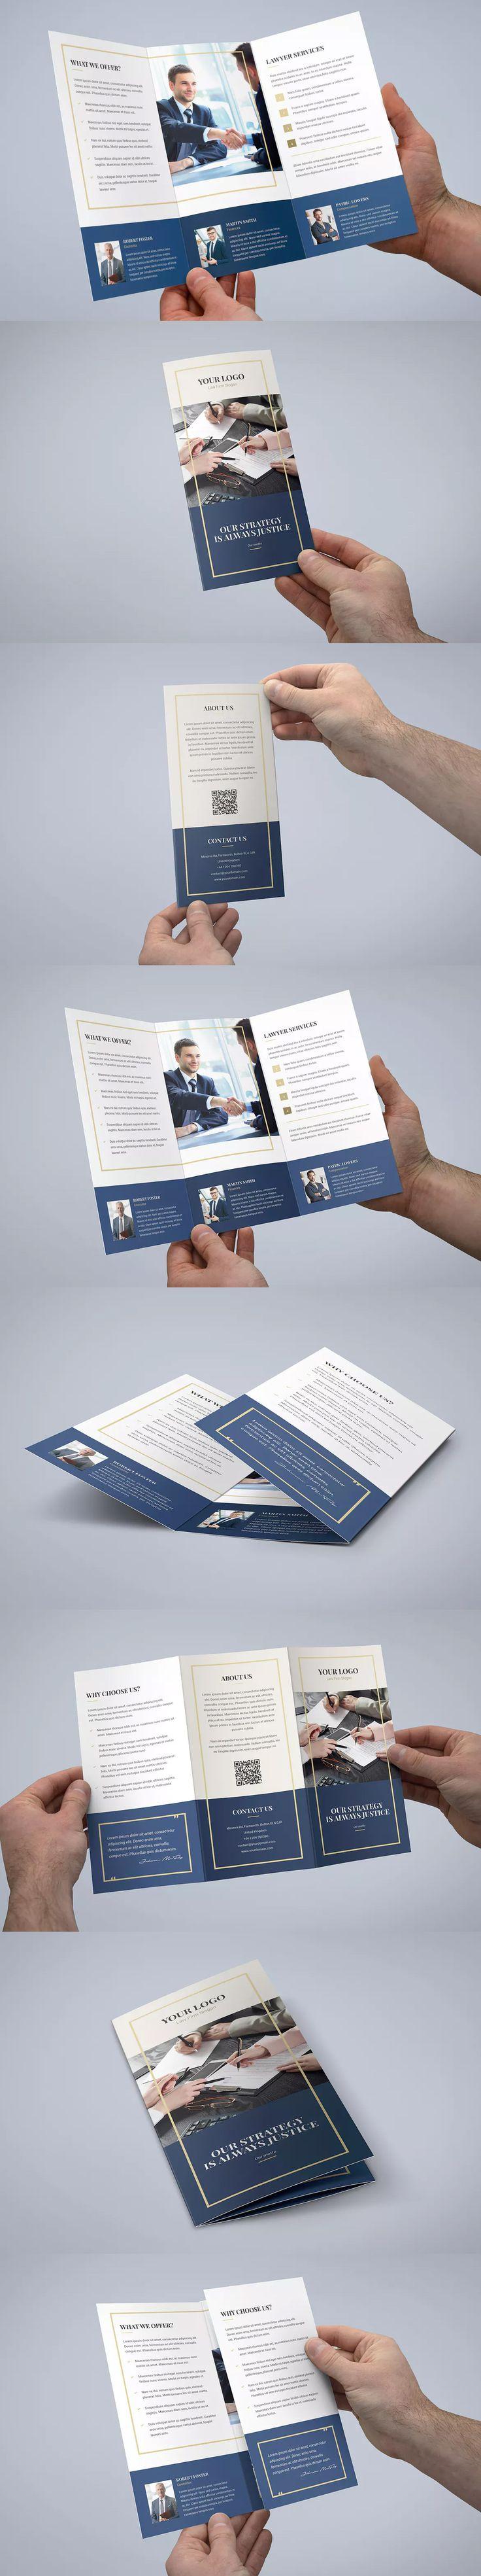 Best Brochure Design Templates Images On Pinterest Brochure - Law firm brochure template